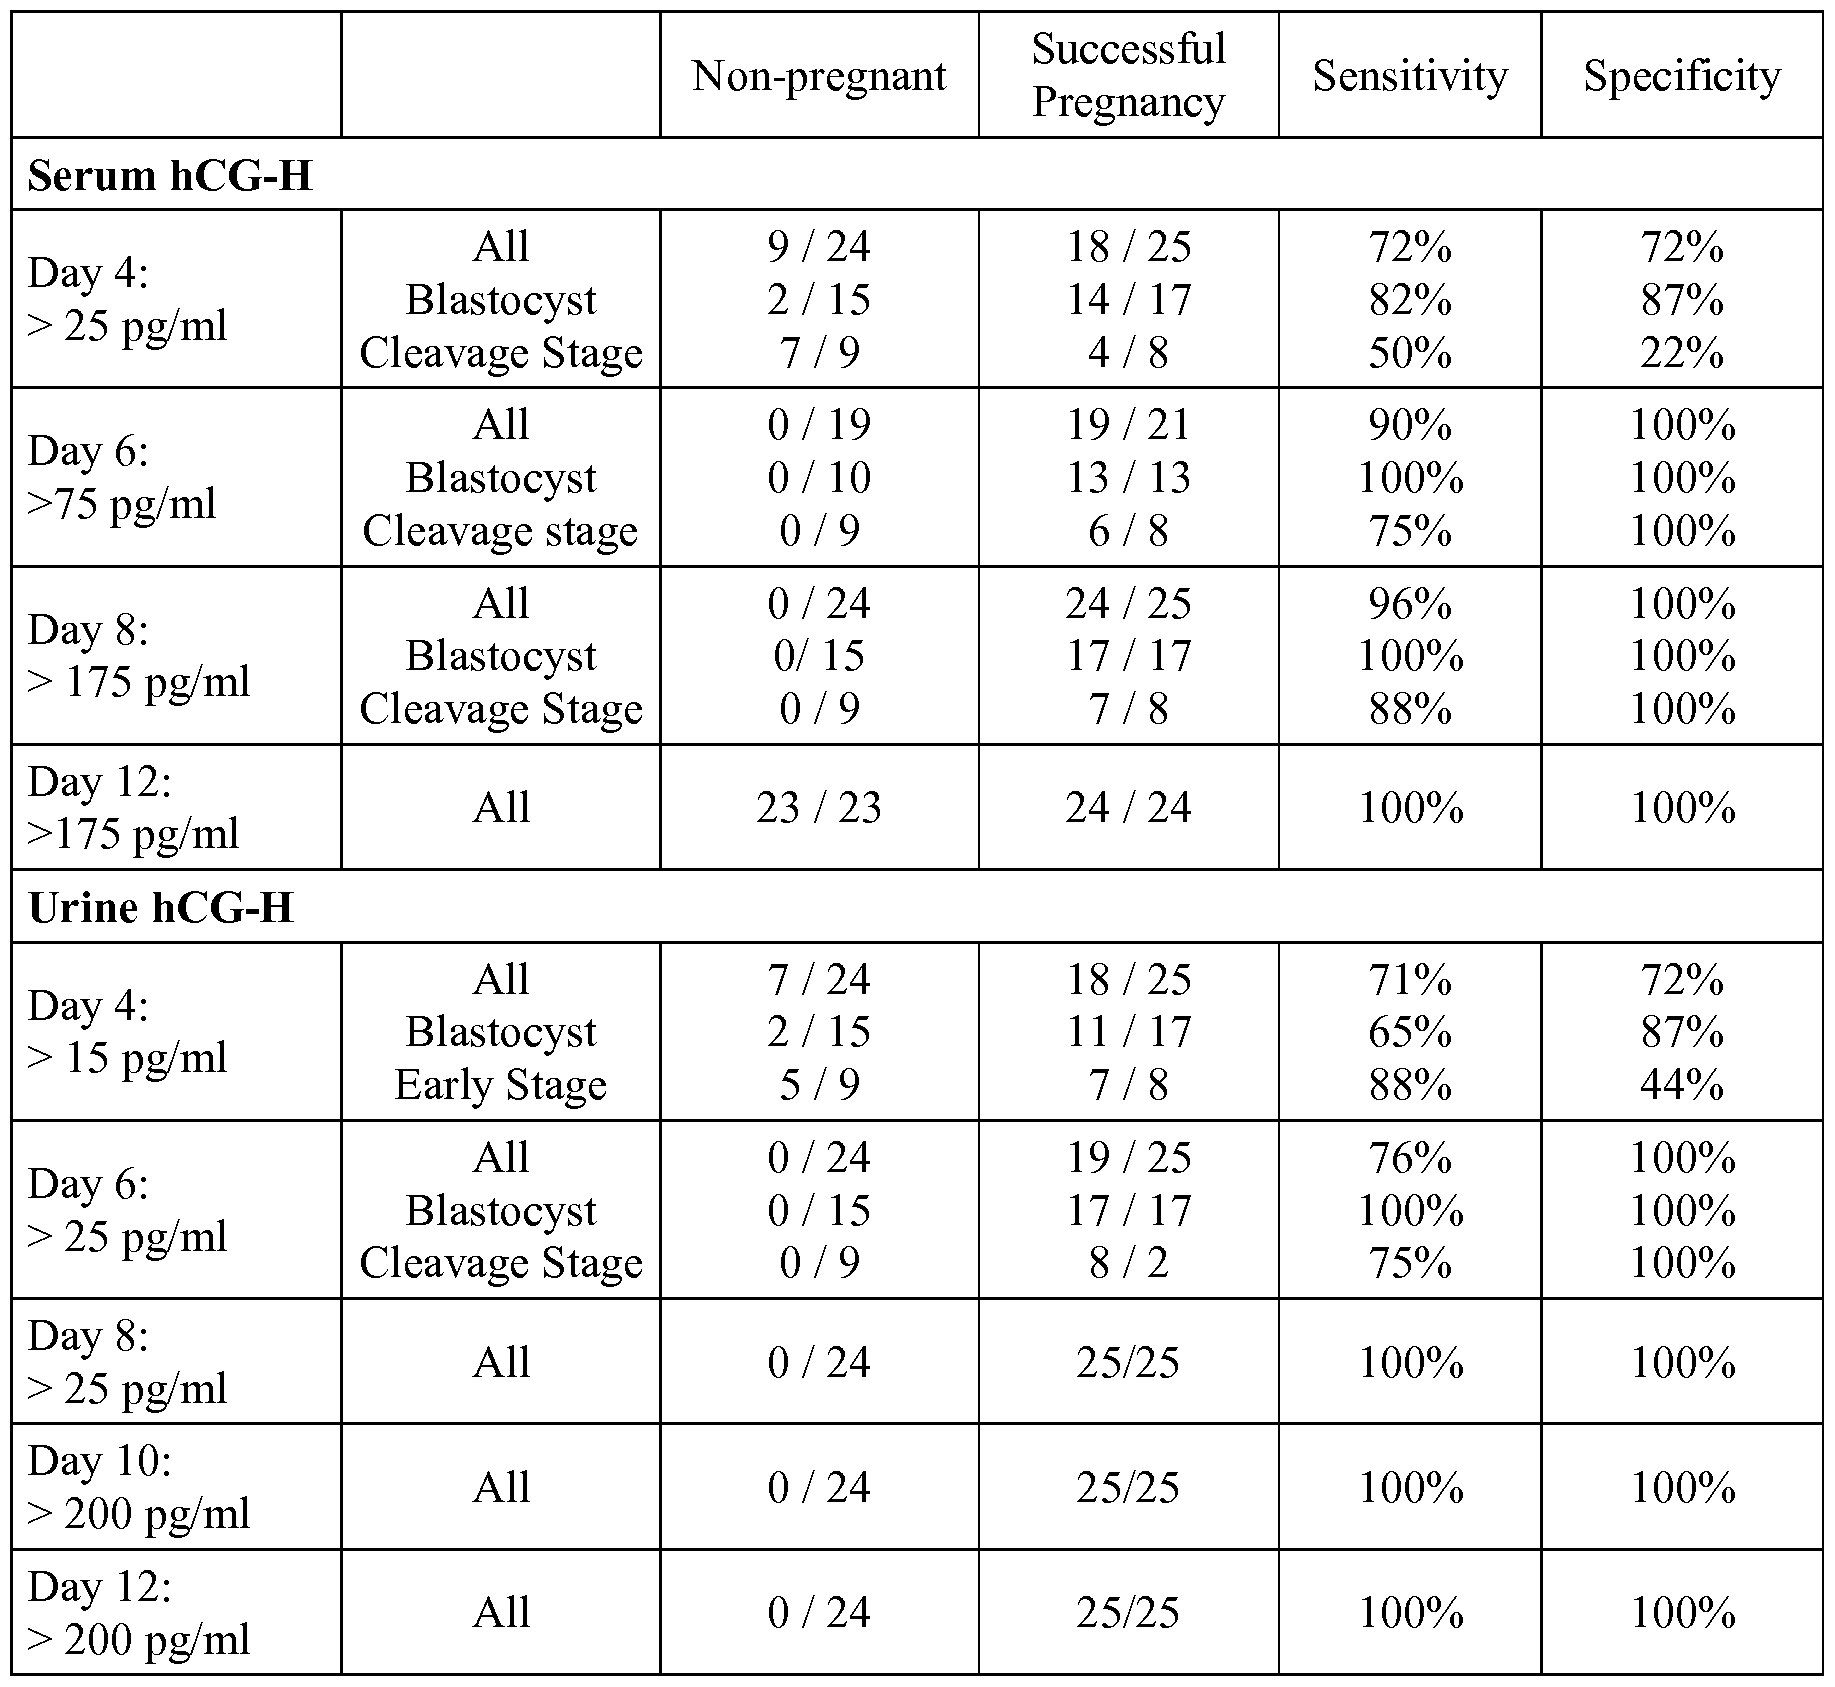 Ivf Pregnancy Test Hcg Levels - Pregnancy Symptoms